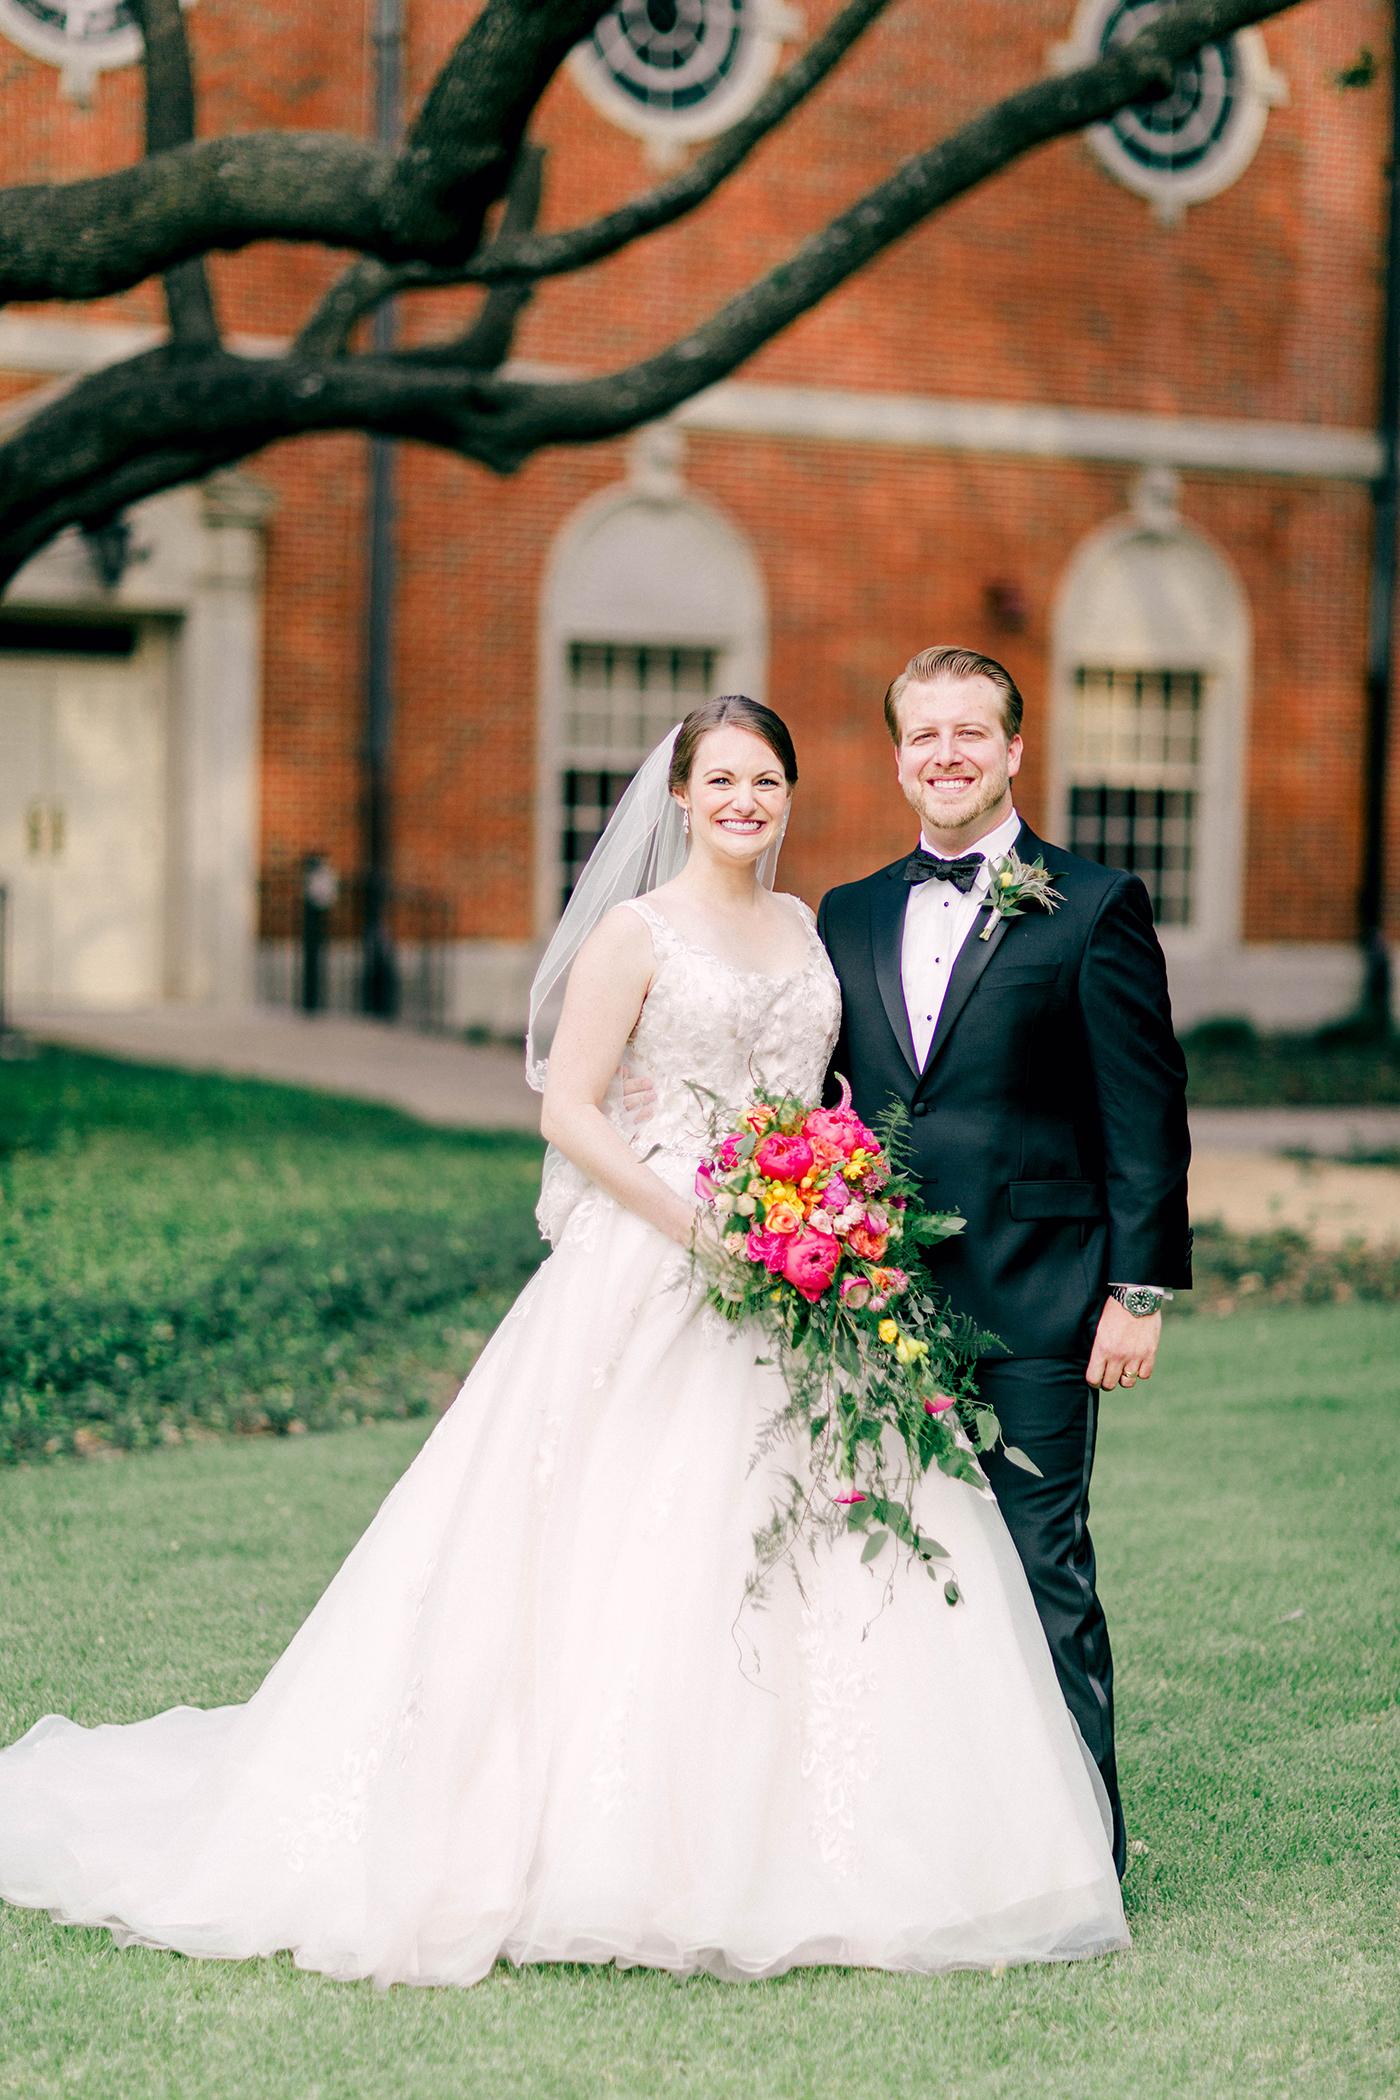 Dallas TX Wedding Planner - Allday Events - Hall on Dragon Wedding - 00004.jpg